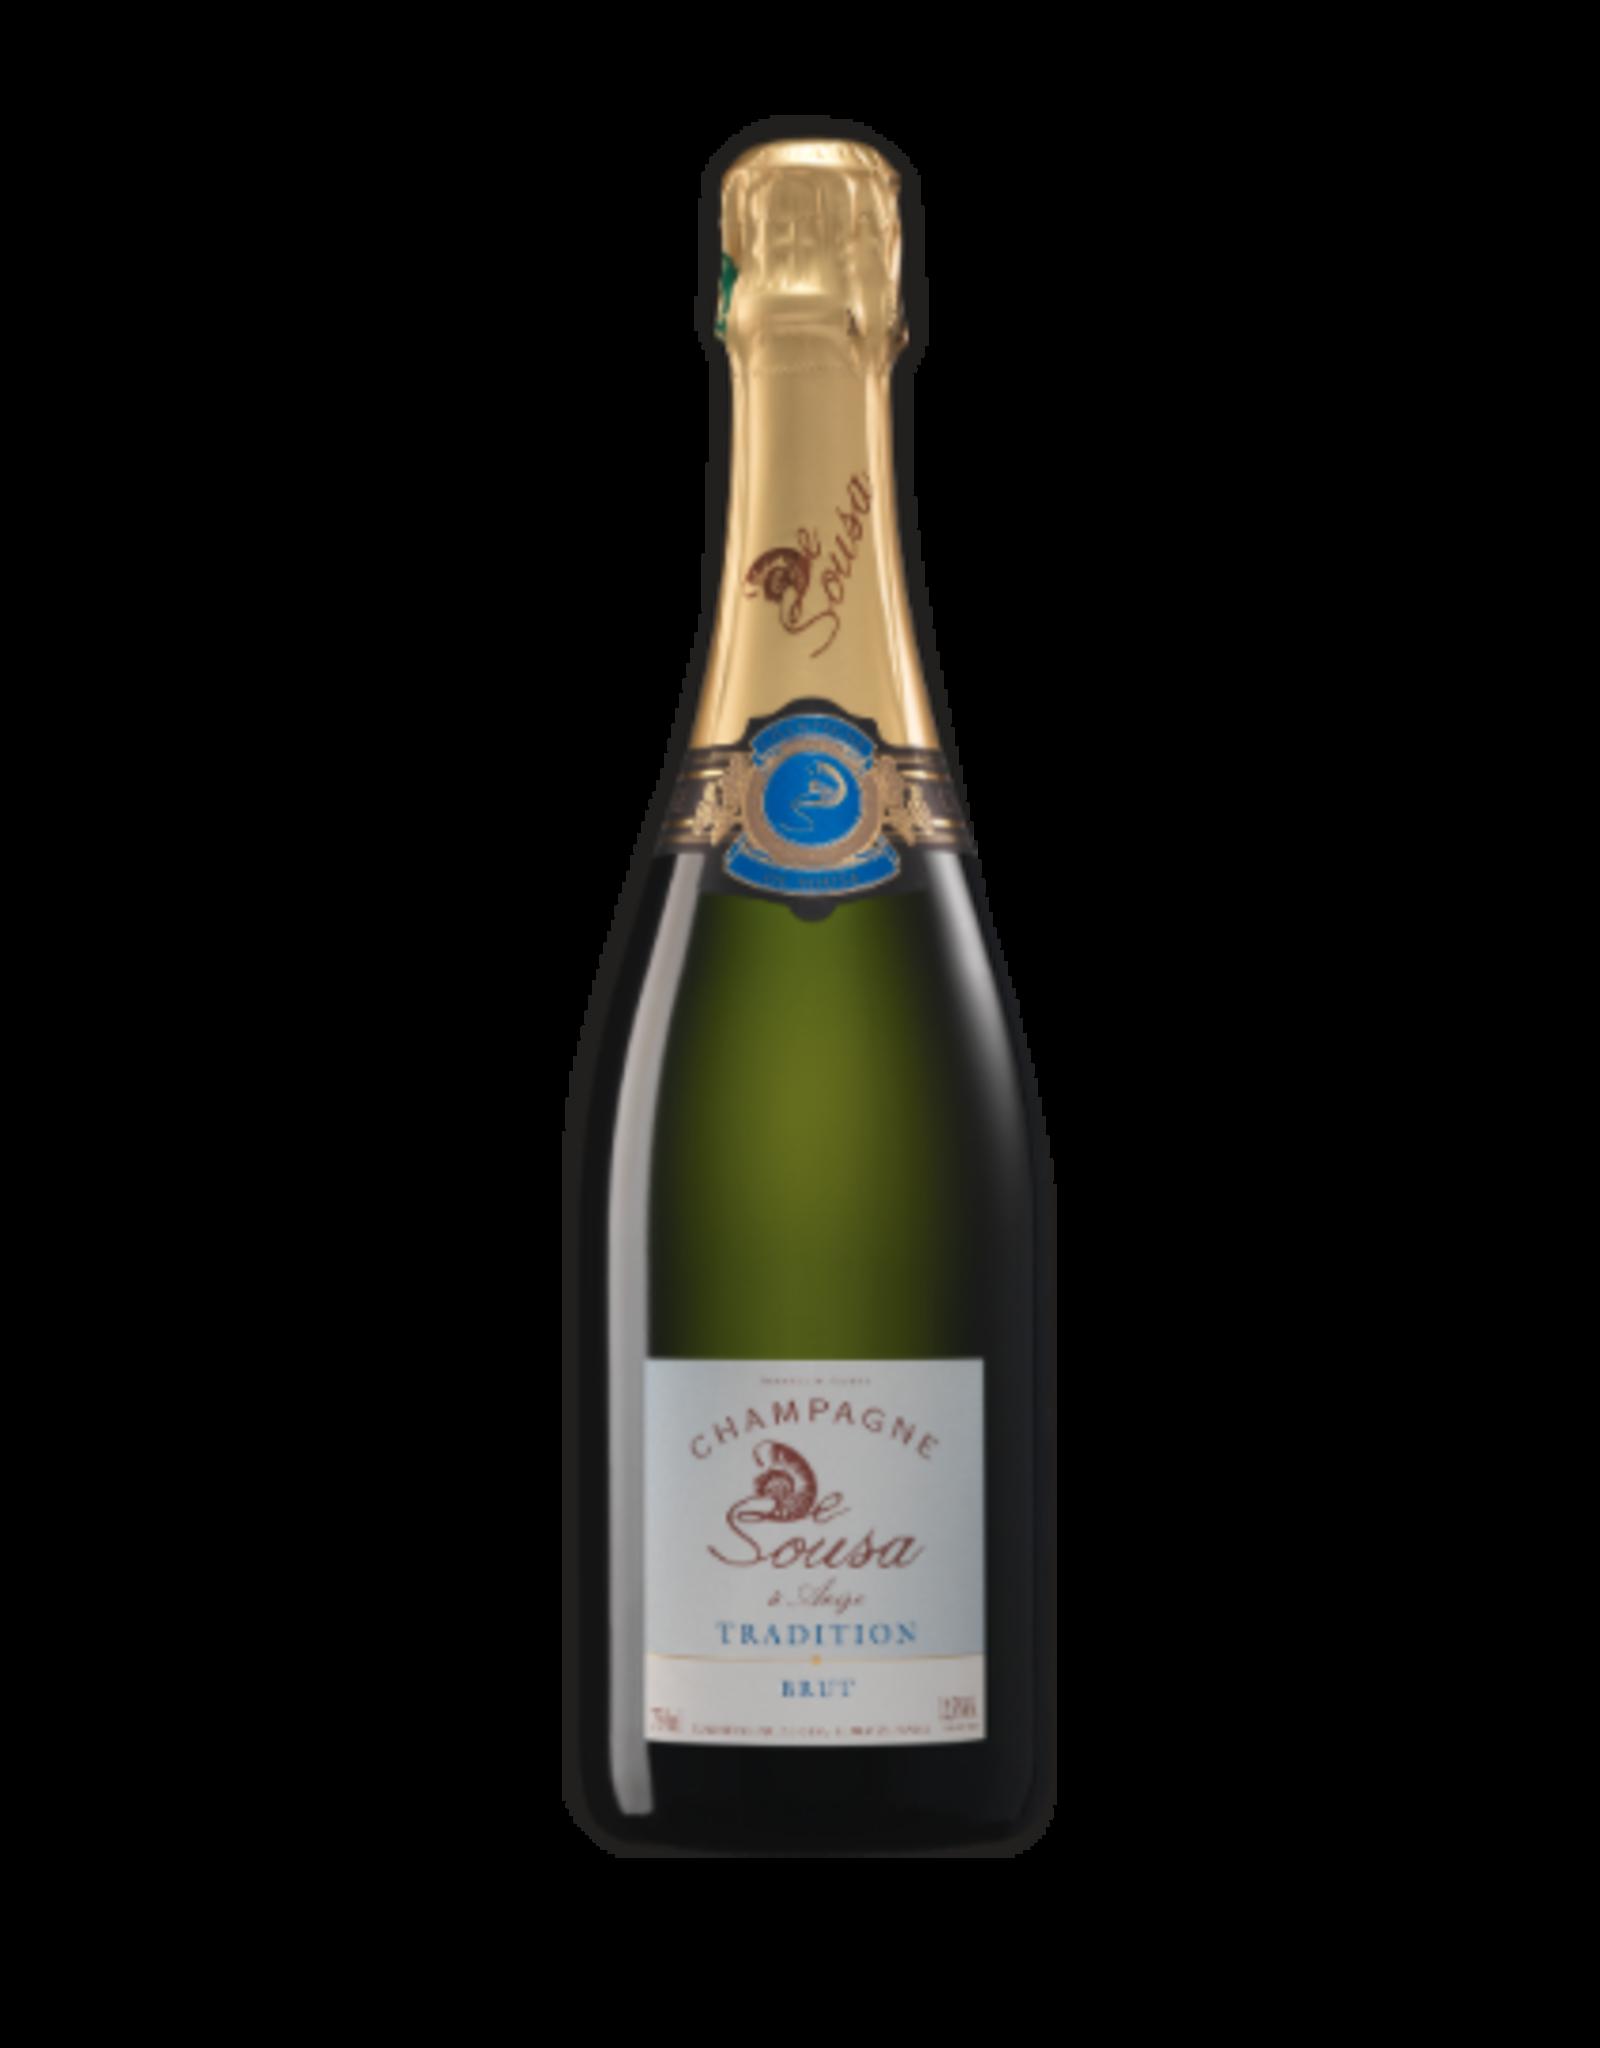 De Sousa Champagne De Sousa Tradition Brut